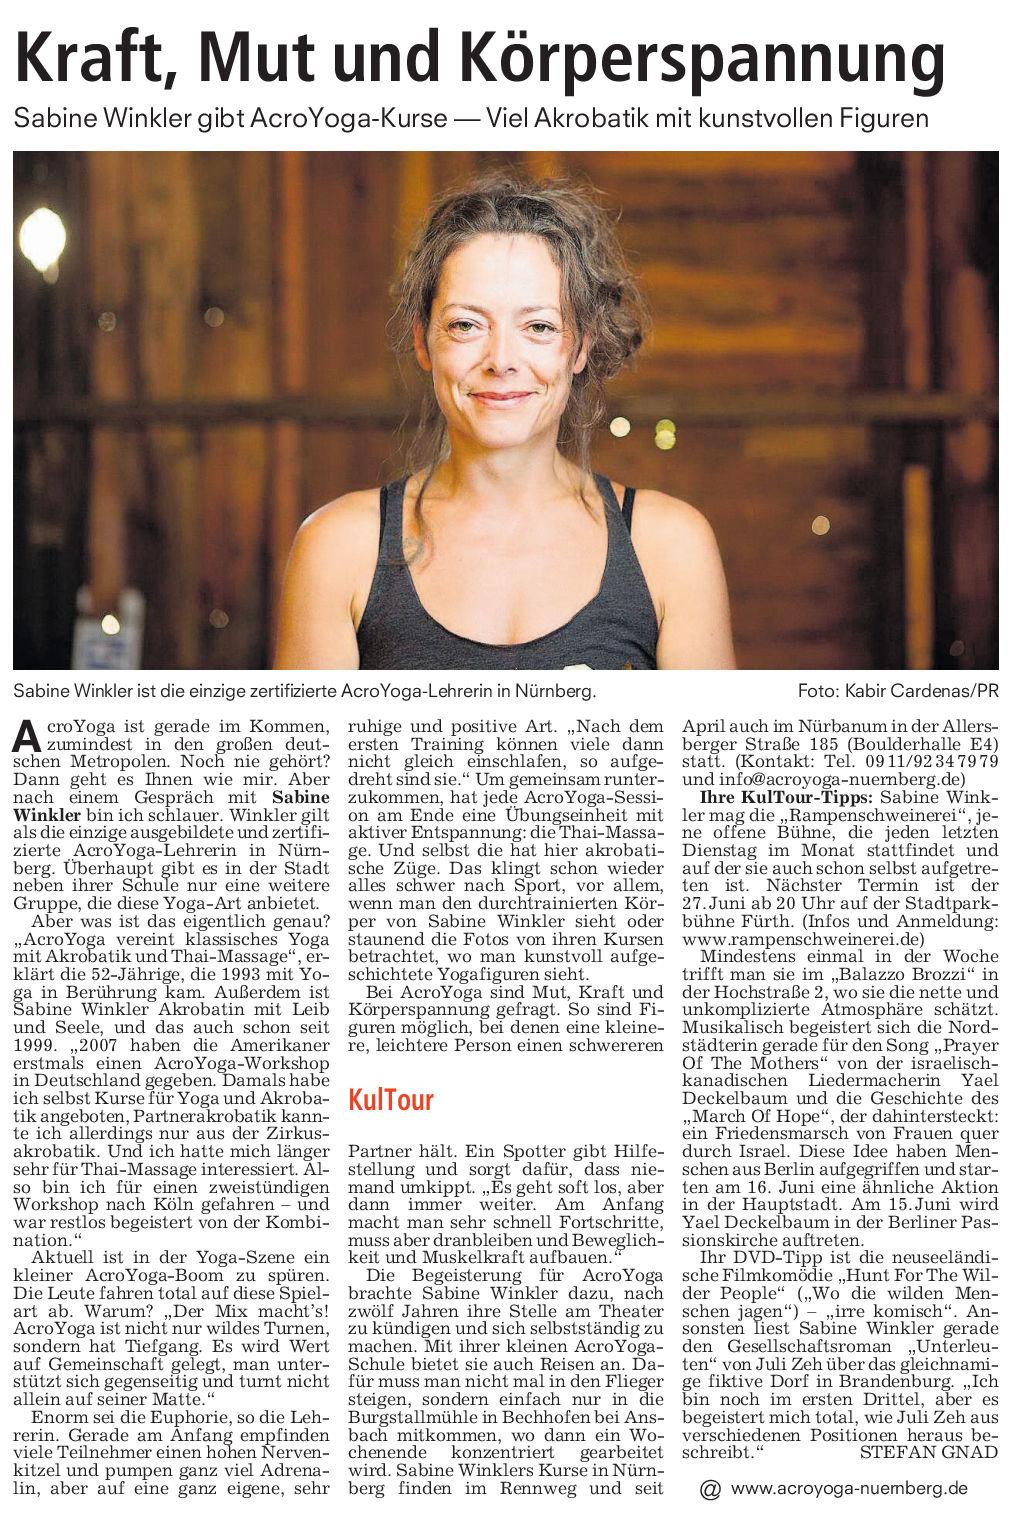 Nürnberger Nachrichten, Stadtanzeiger, 31.05.2017